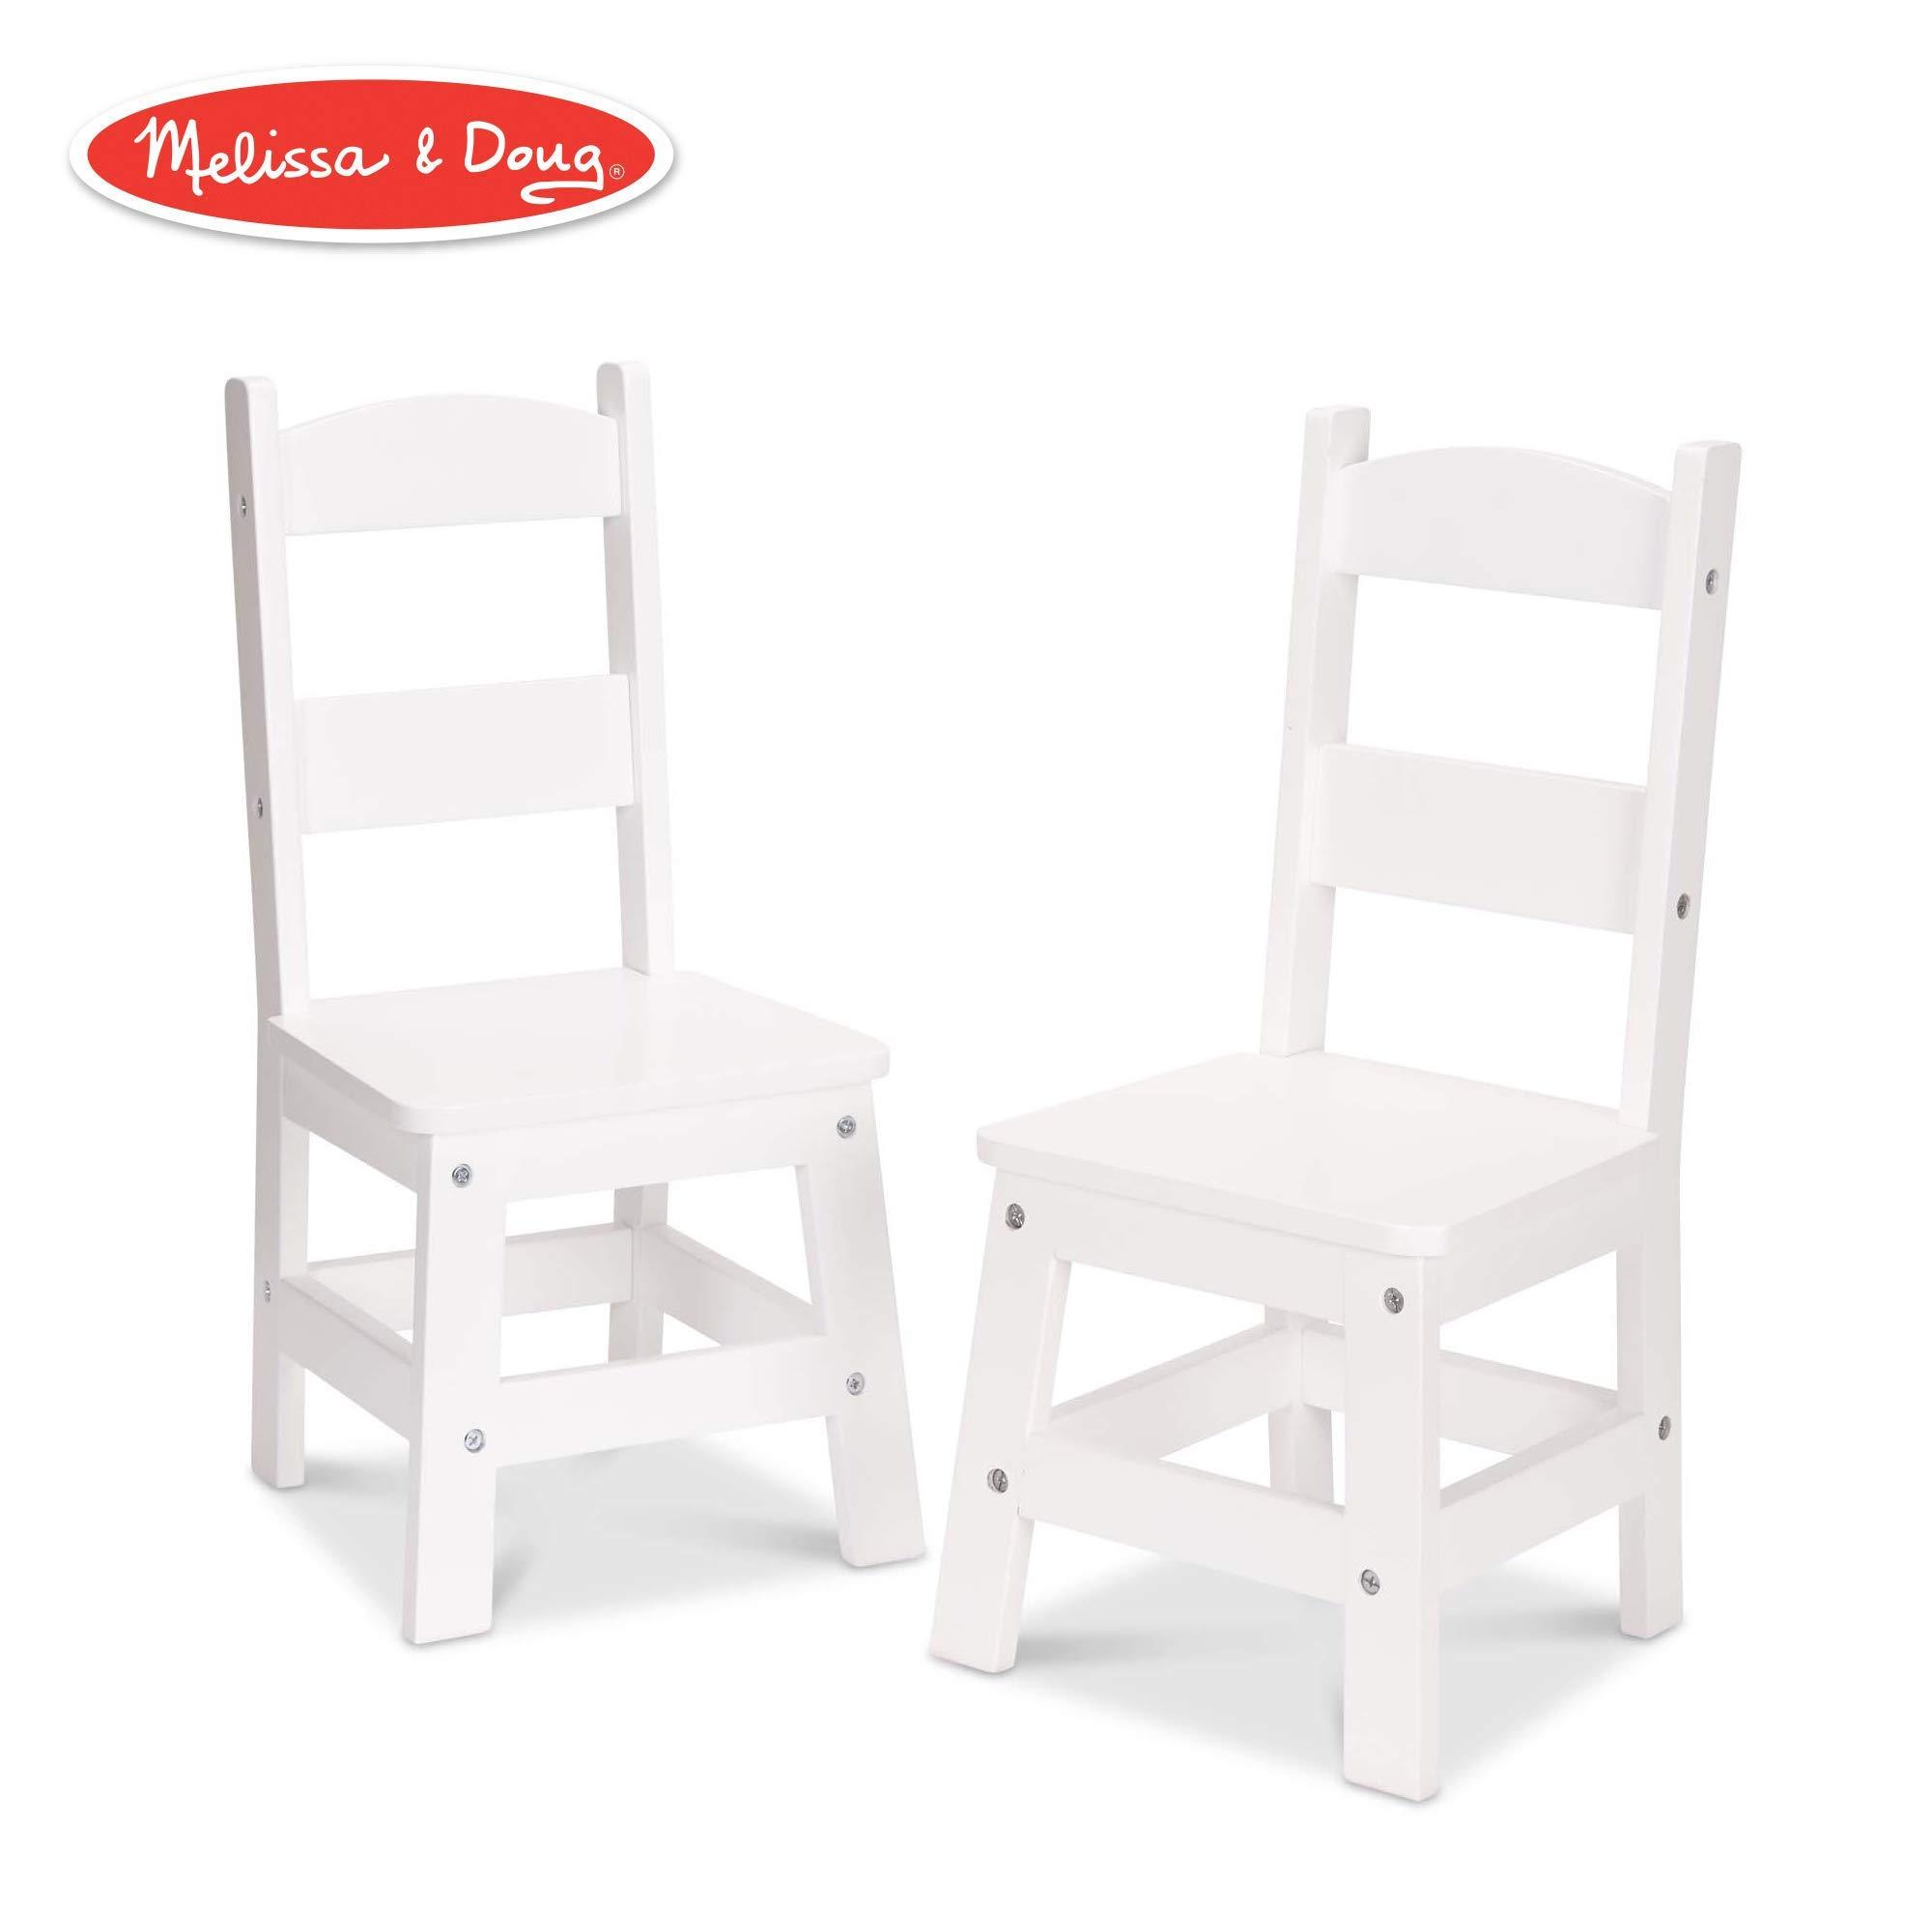 Melissa & Doug Wooden Chair Pair - White Children's Furniture (Renewed) by Melissa & Doug